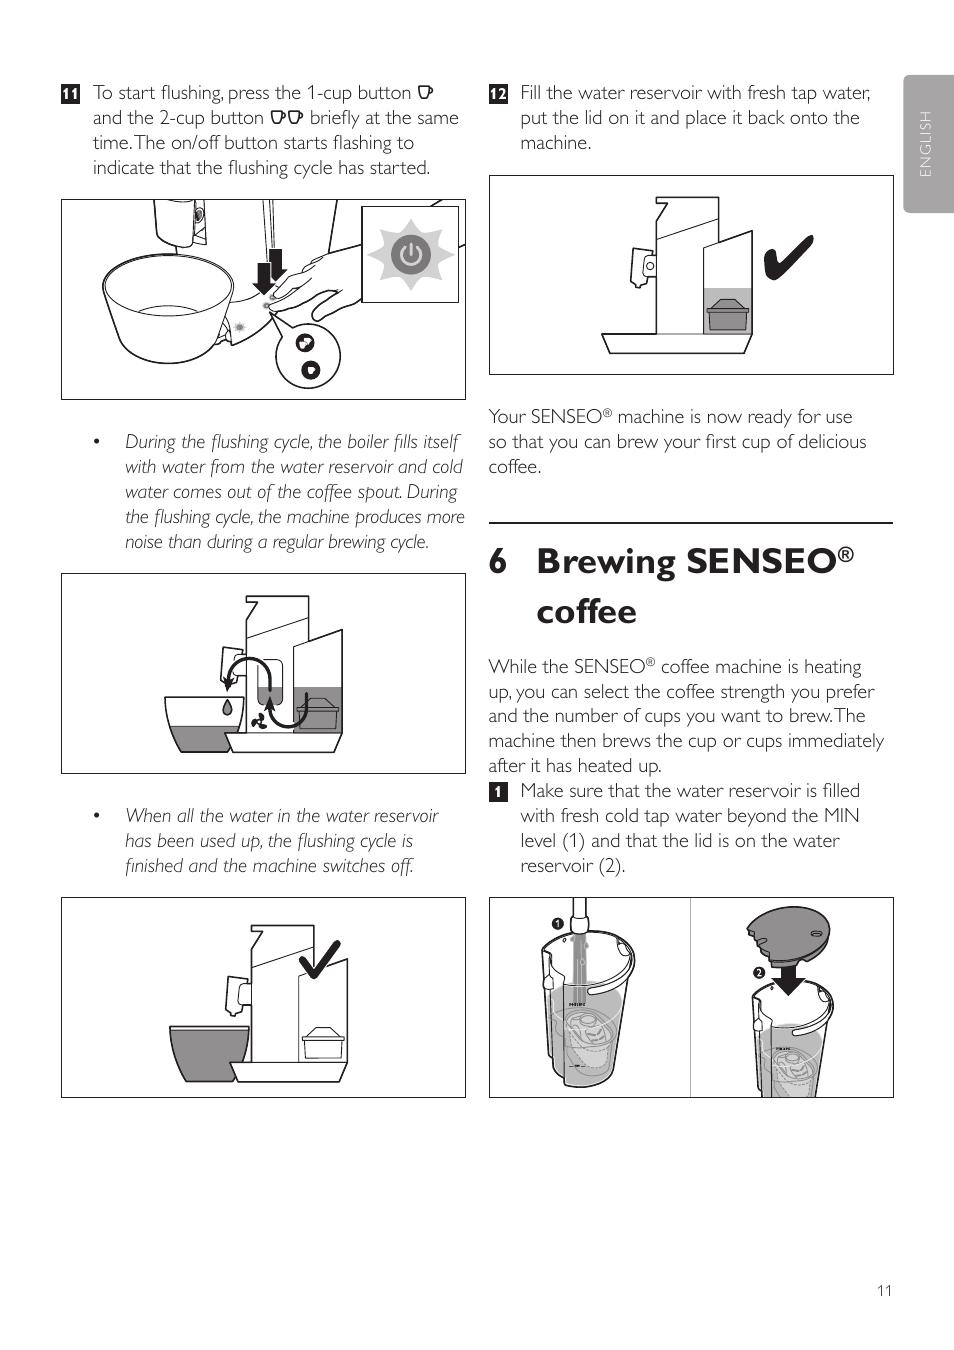 6 brewing senseo, Coffee   Philips SENSEO® Twist